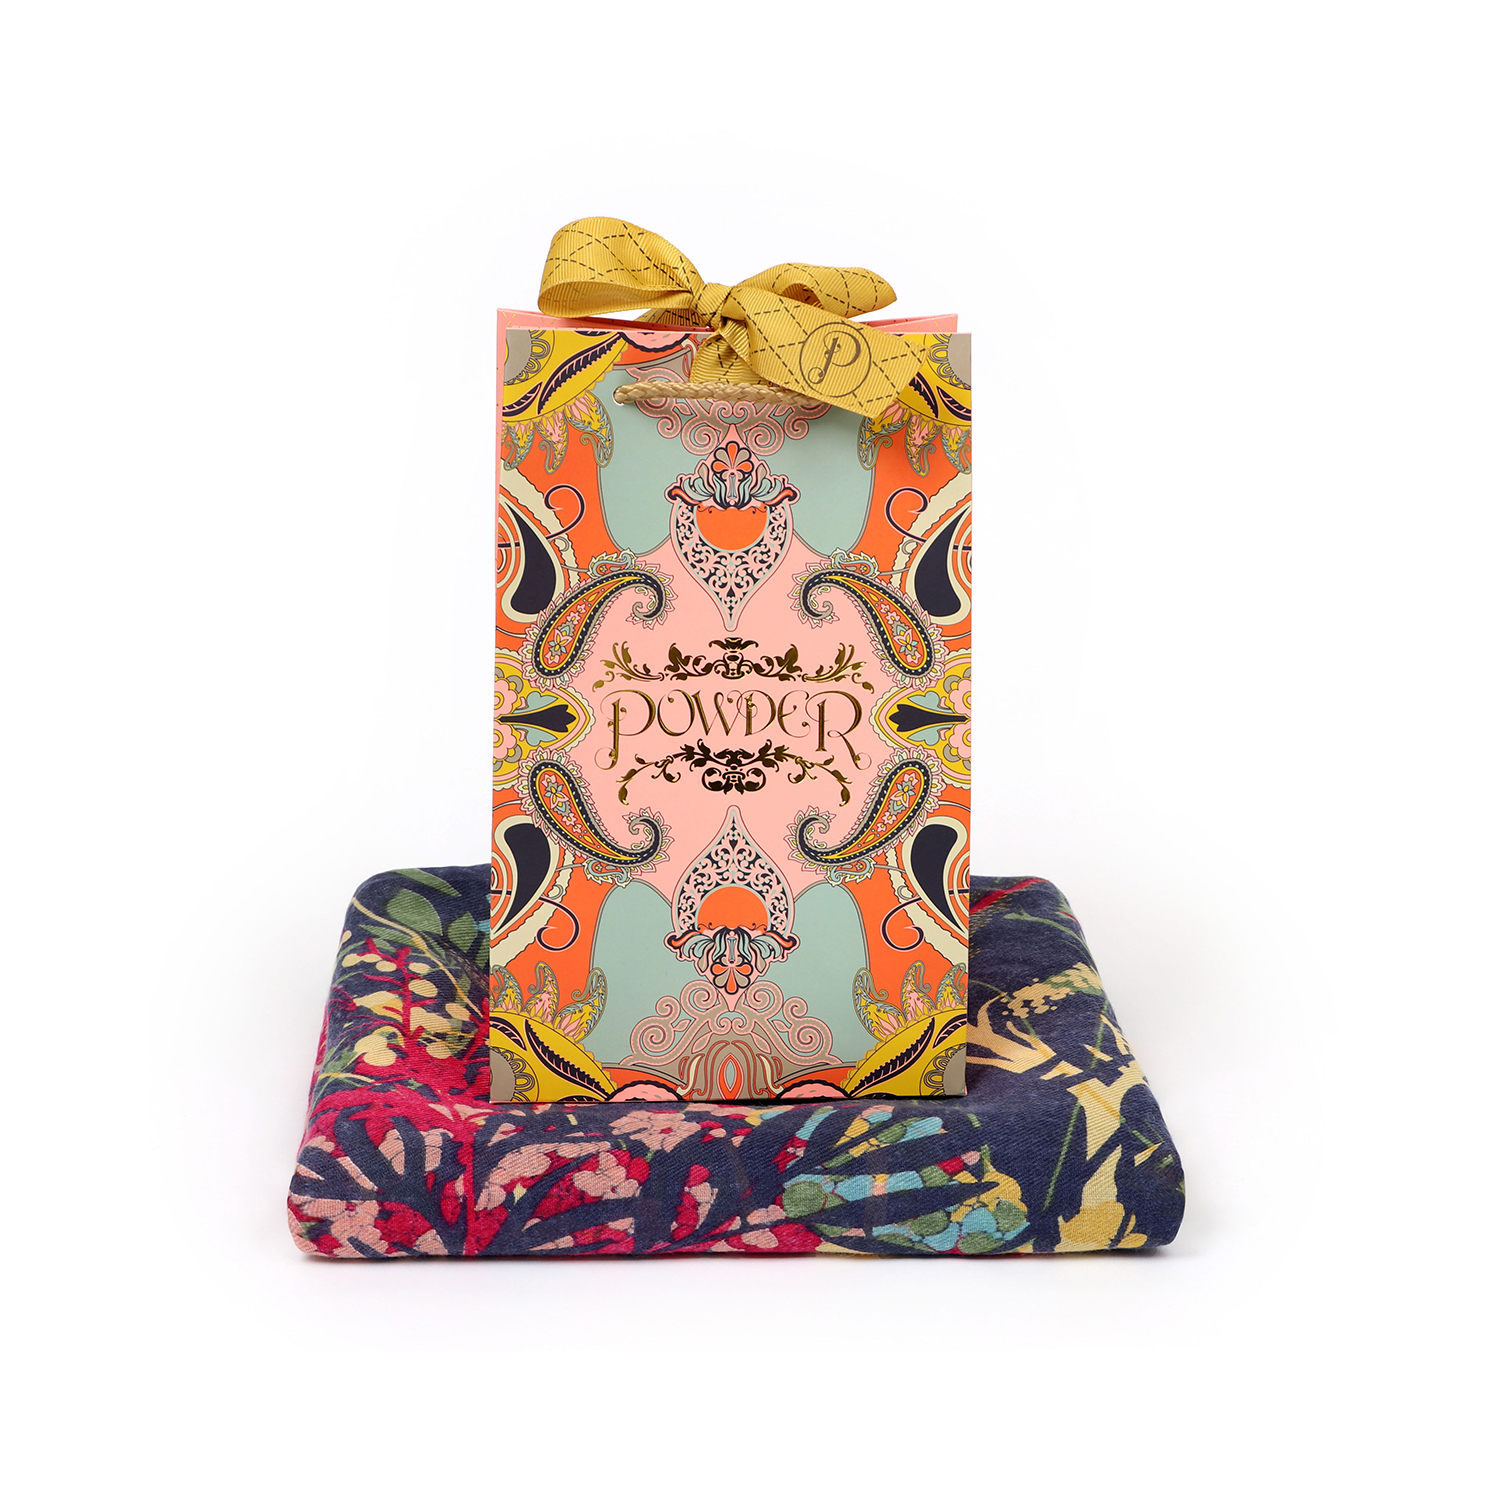 Powder – Cottage Garden Print Scarf with Powder Presentation Gift Bag